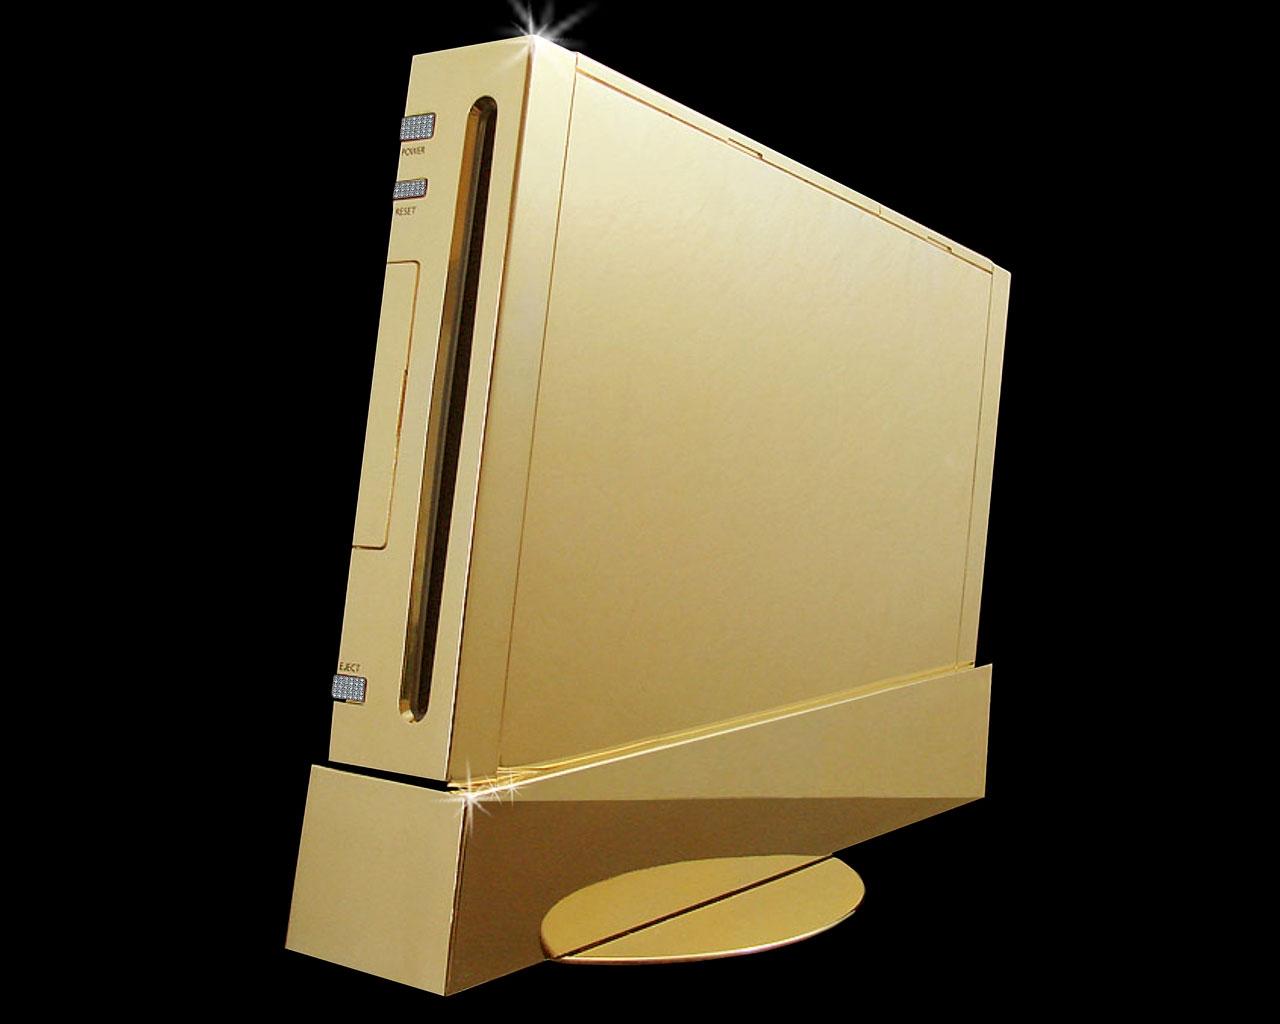 Nintendo Wii Supreme